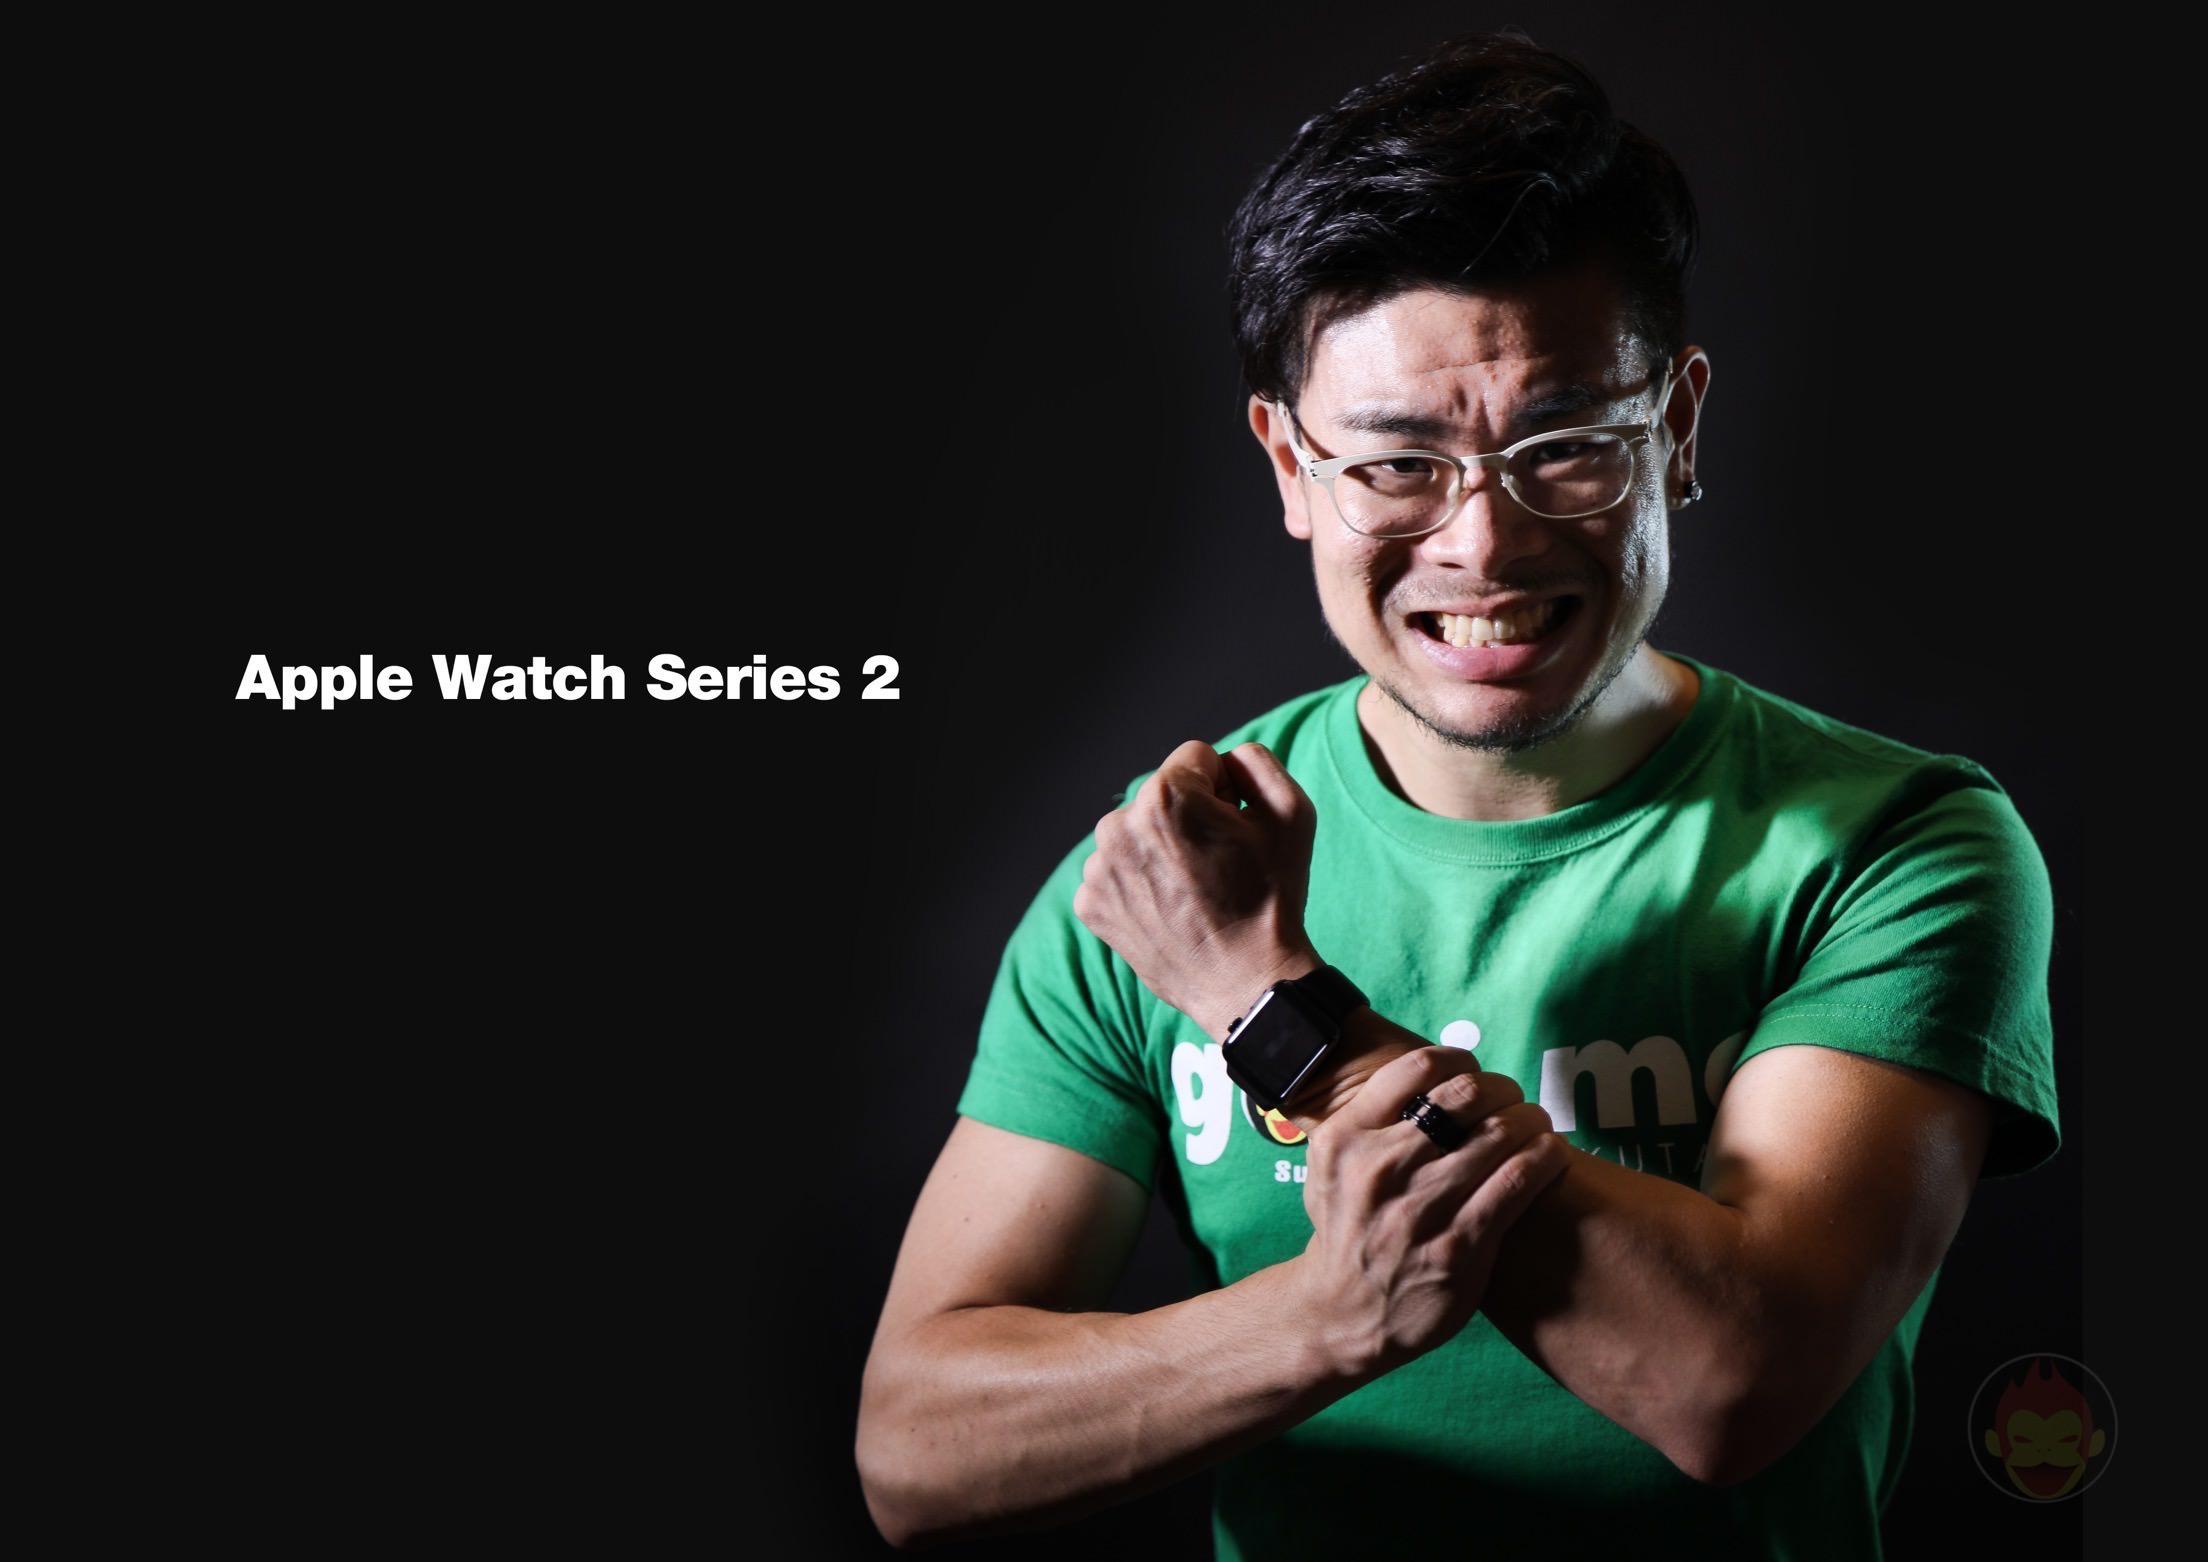 Apple-Watch-Series-2-Gori-01.jpg